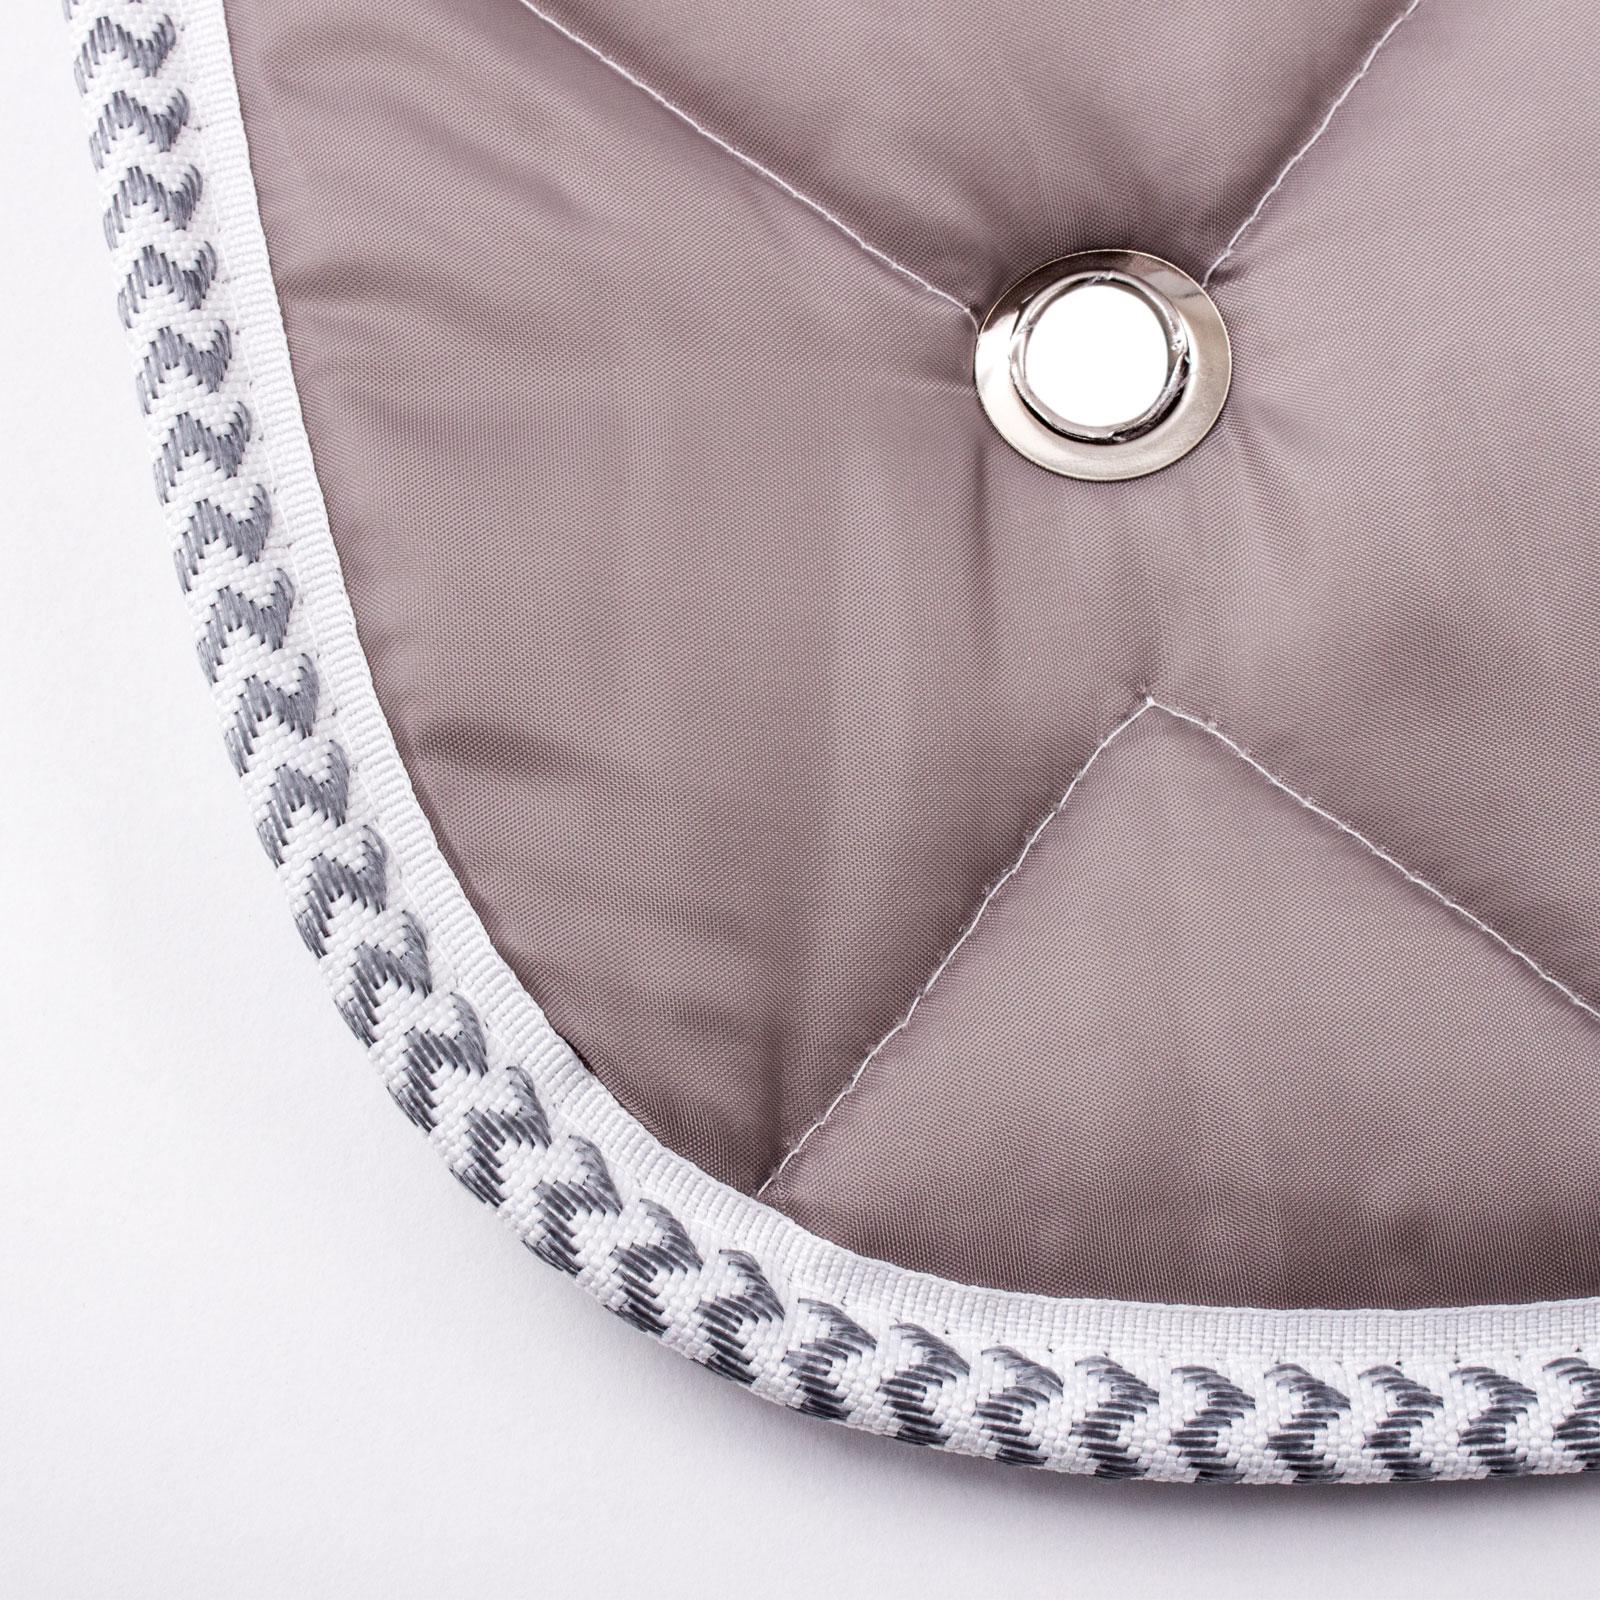 isoflex thermomatte fahrerhaus sonnenschutz f r vw t5. Black Bedroom Furniture Sets. Home Design Ideas